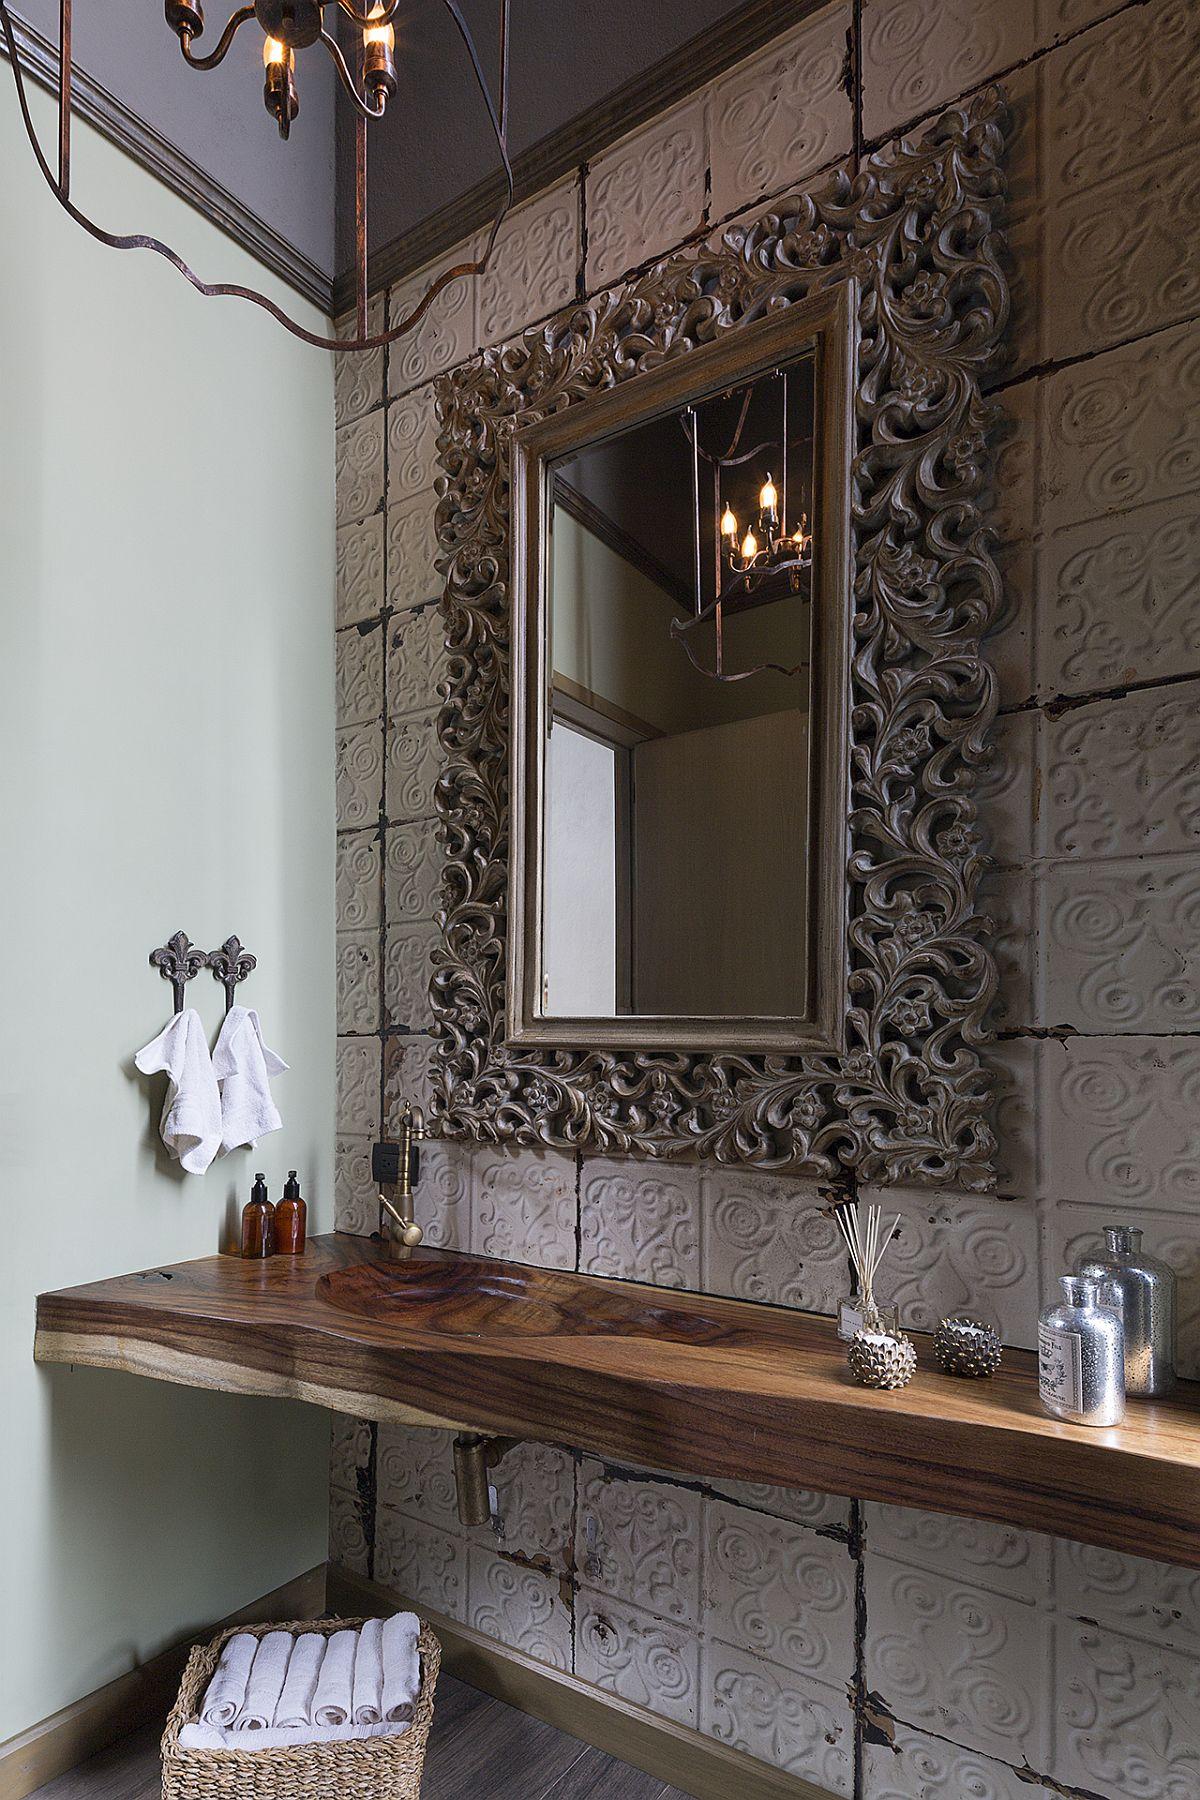 Custom-mirror-frame-and-vaniy-inside-the-rusic-bathroom-89266